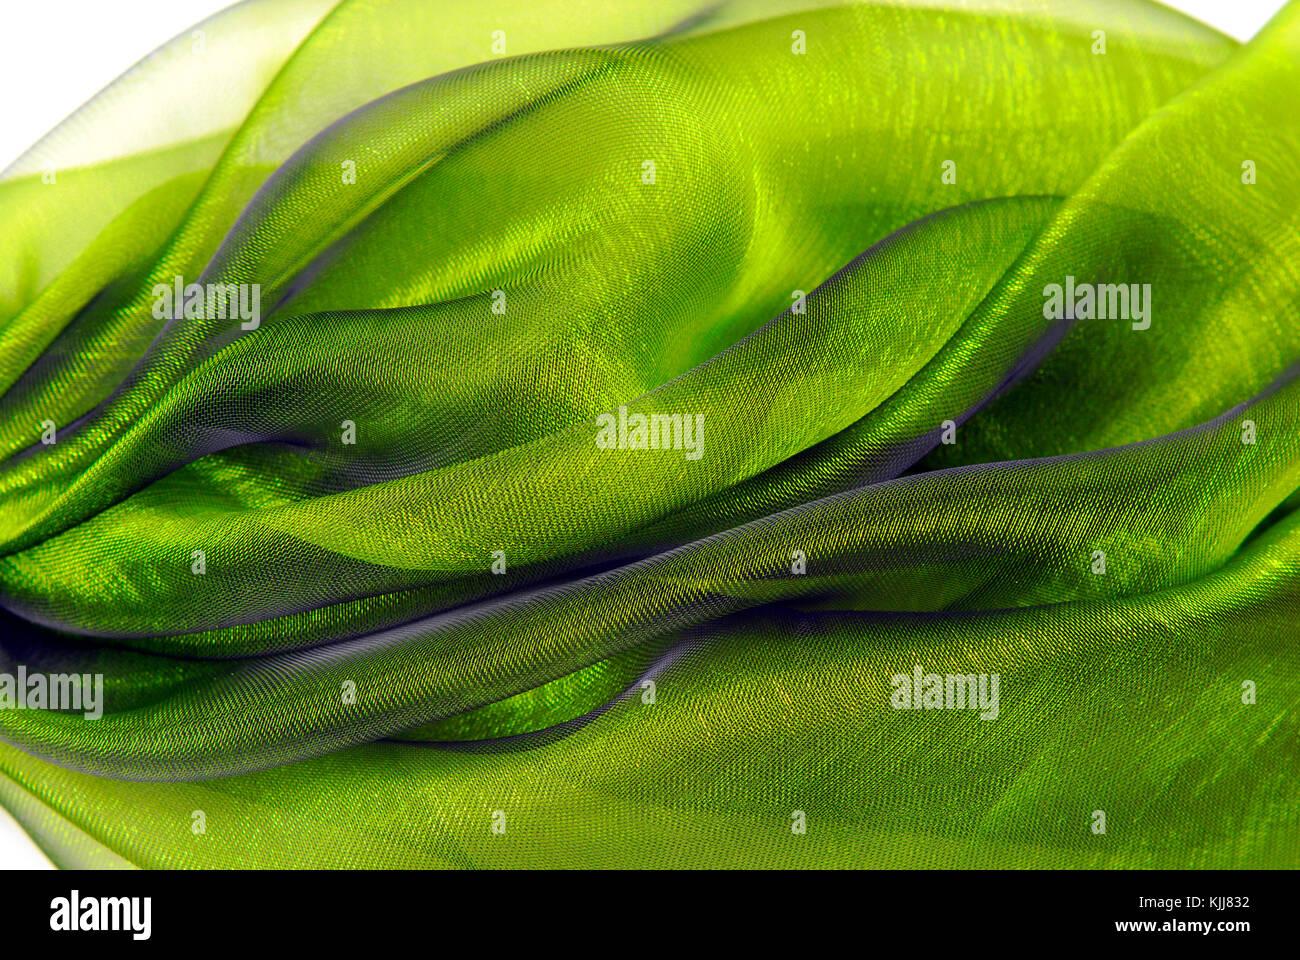 closeup of the wavy organza fabric - Stock Image